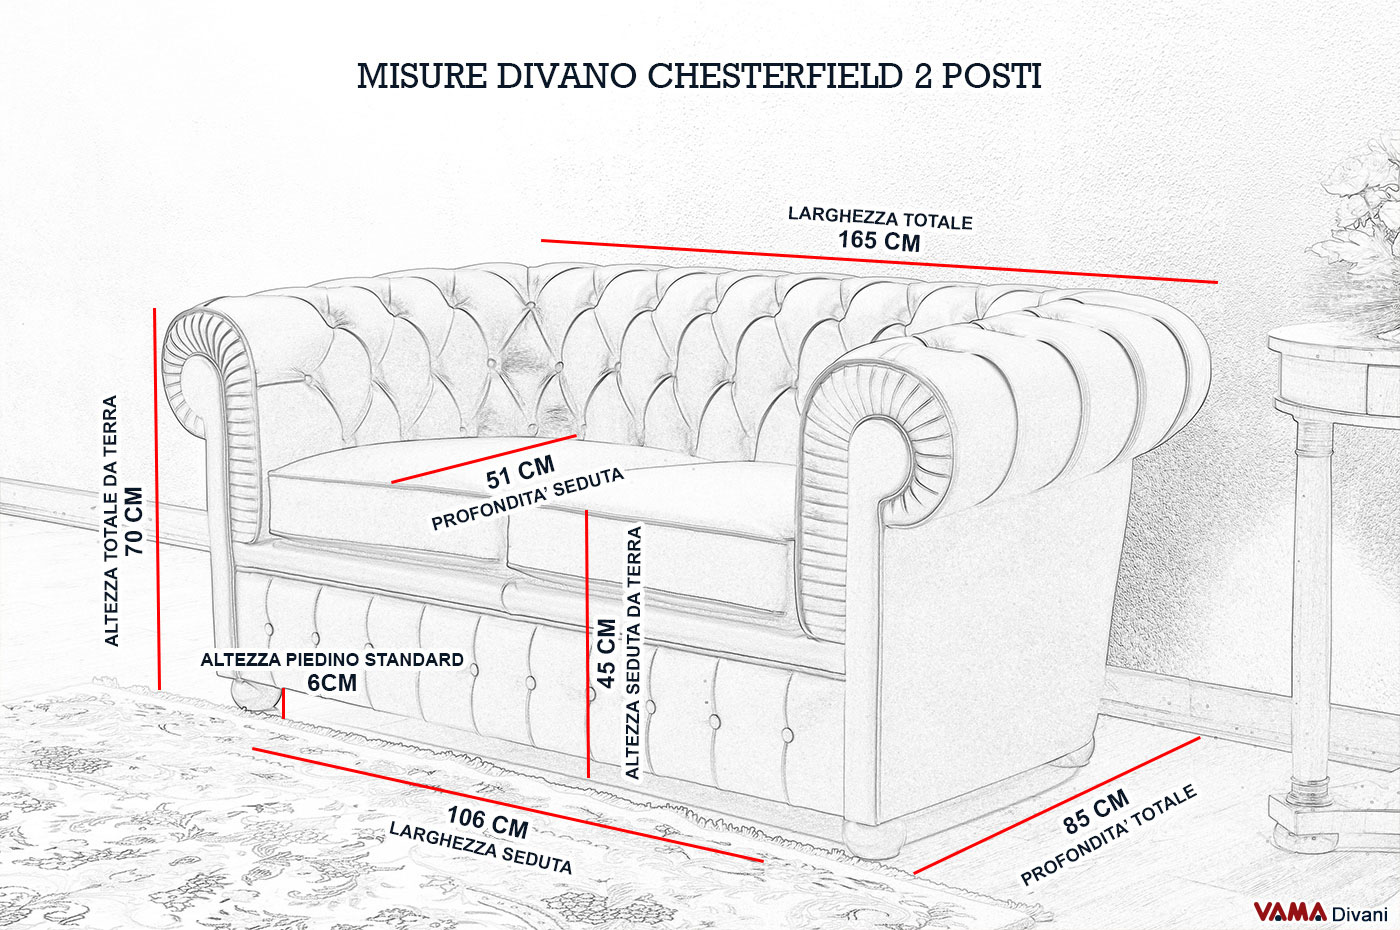 Divano chesterfield 2 posti prezzo rivestimenti e misure for Misure divani angolari 3 posti